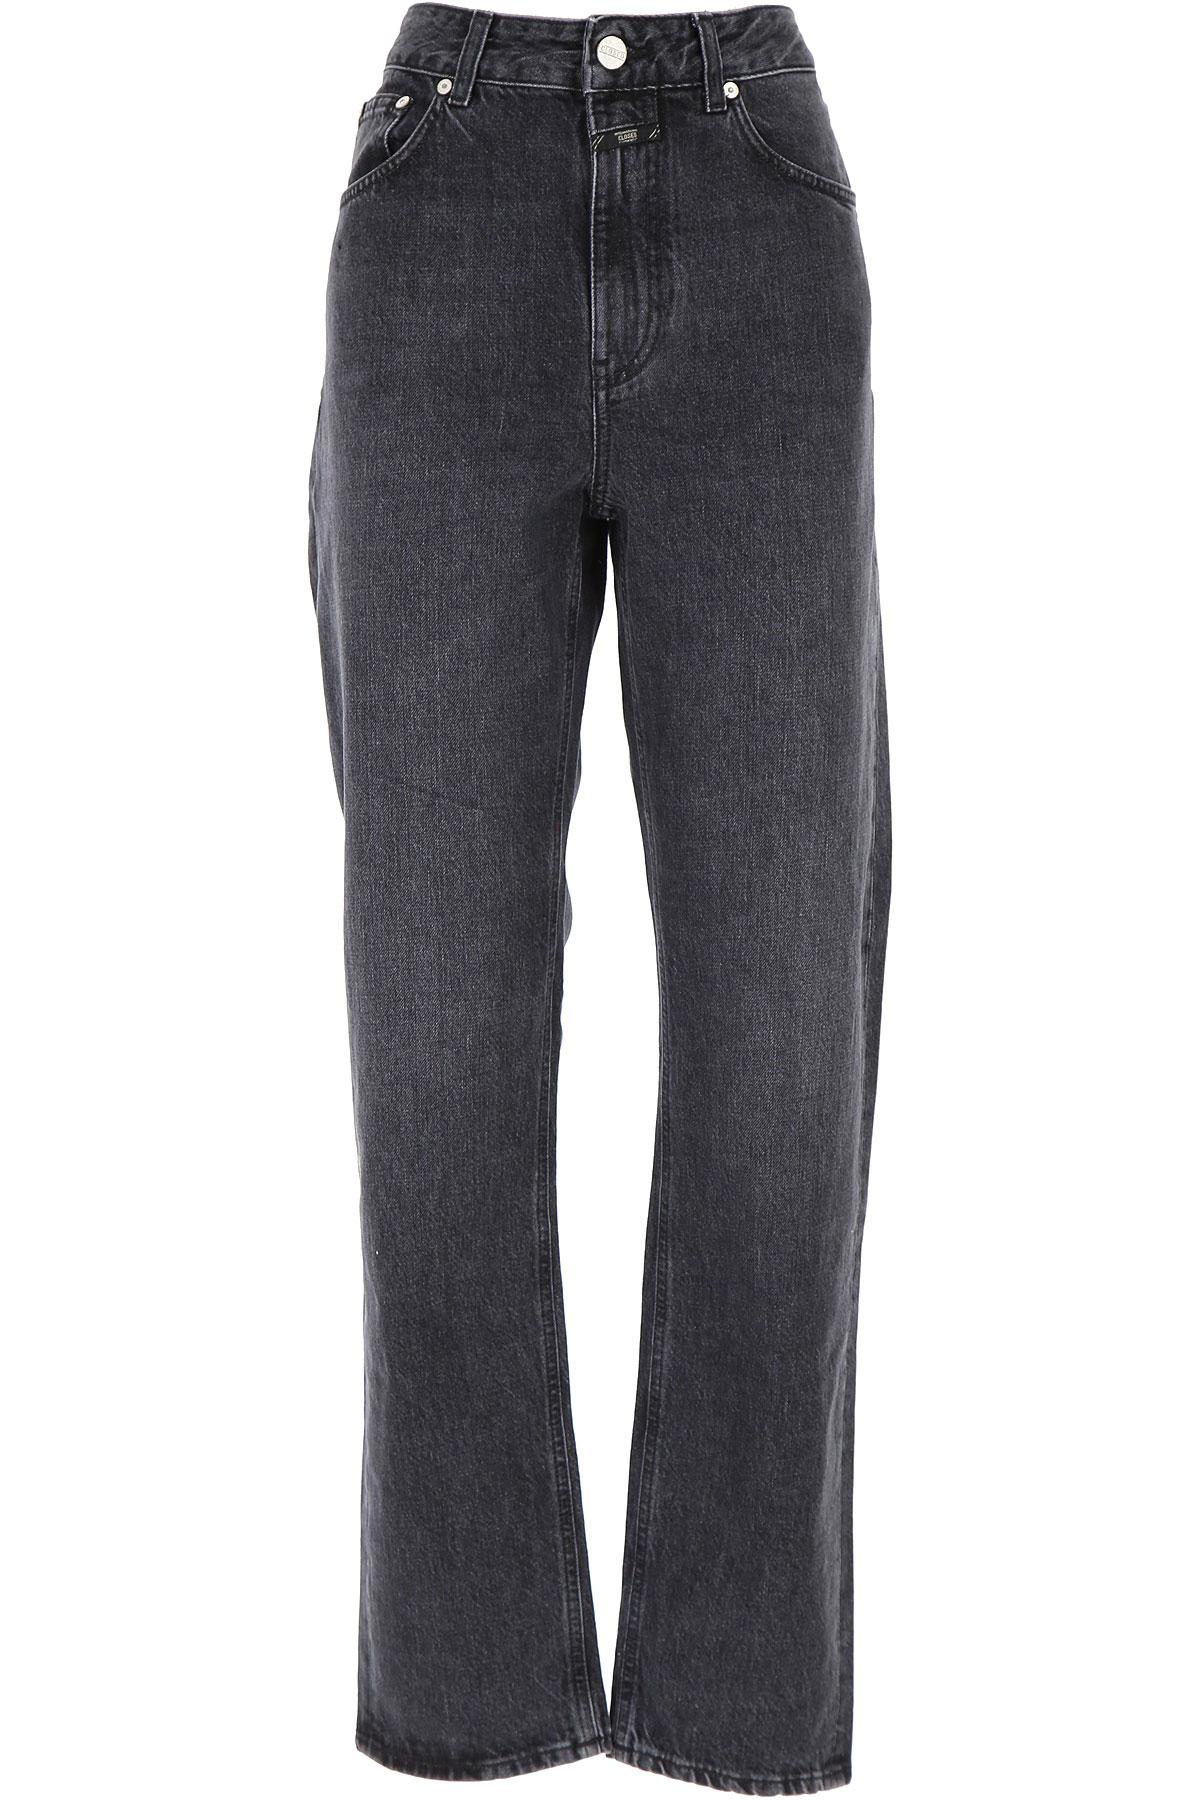 Closed Jeans On Sale, Black, Cotton, 2019, 24 25